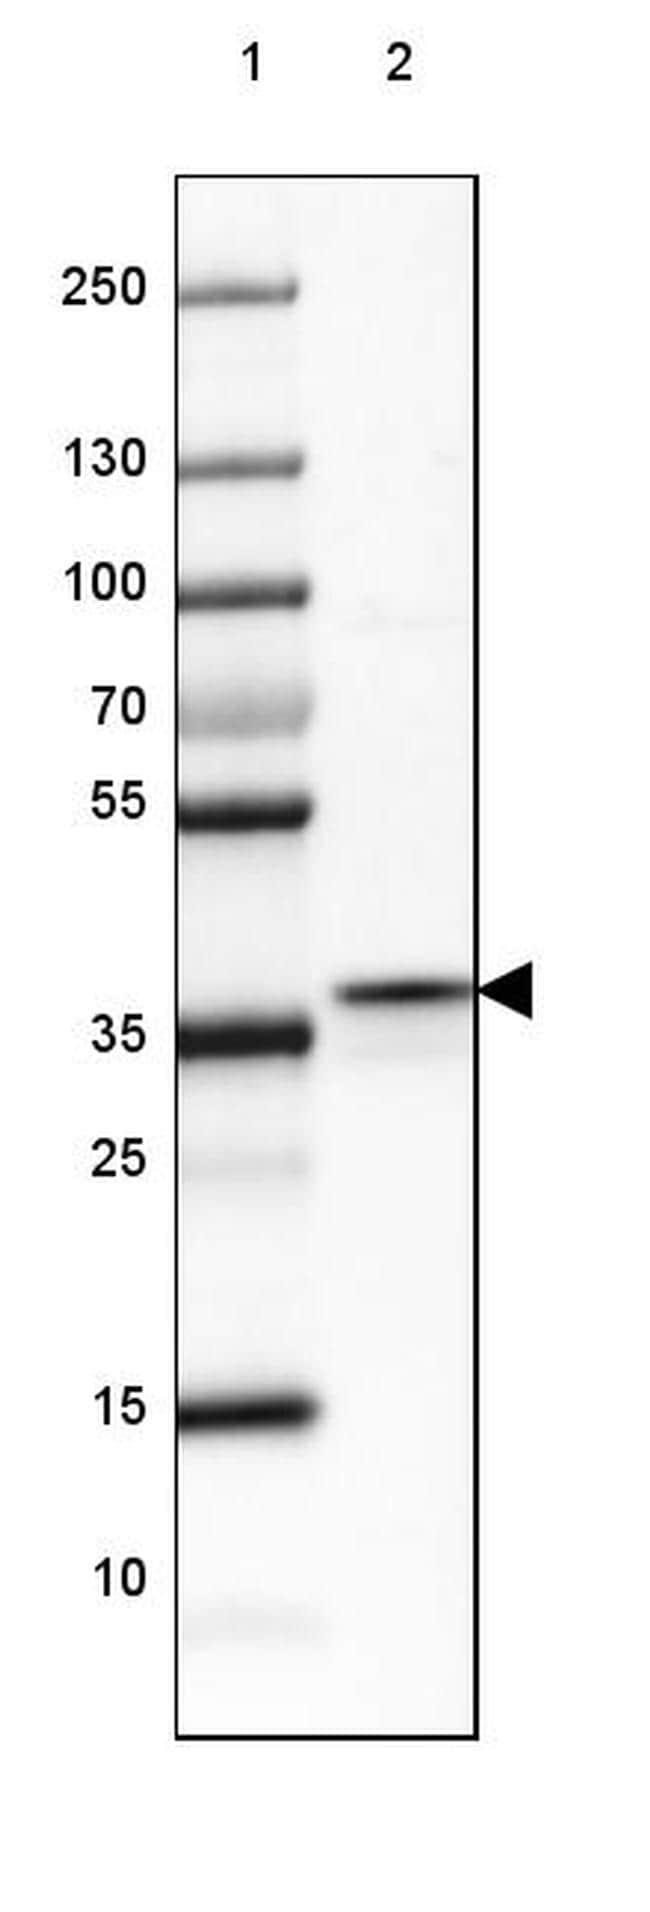 FBP1/FBP2 Antibody in Western Blot (WB)